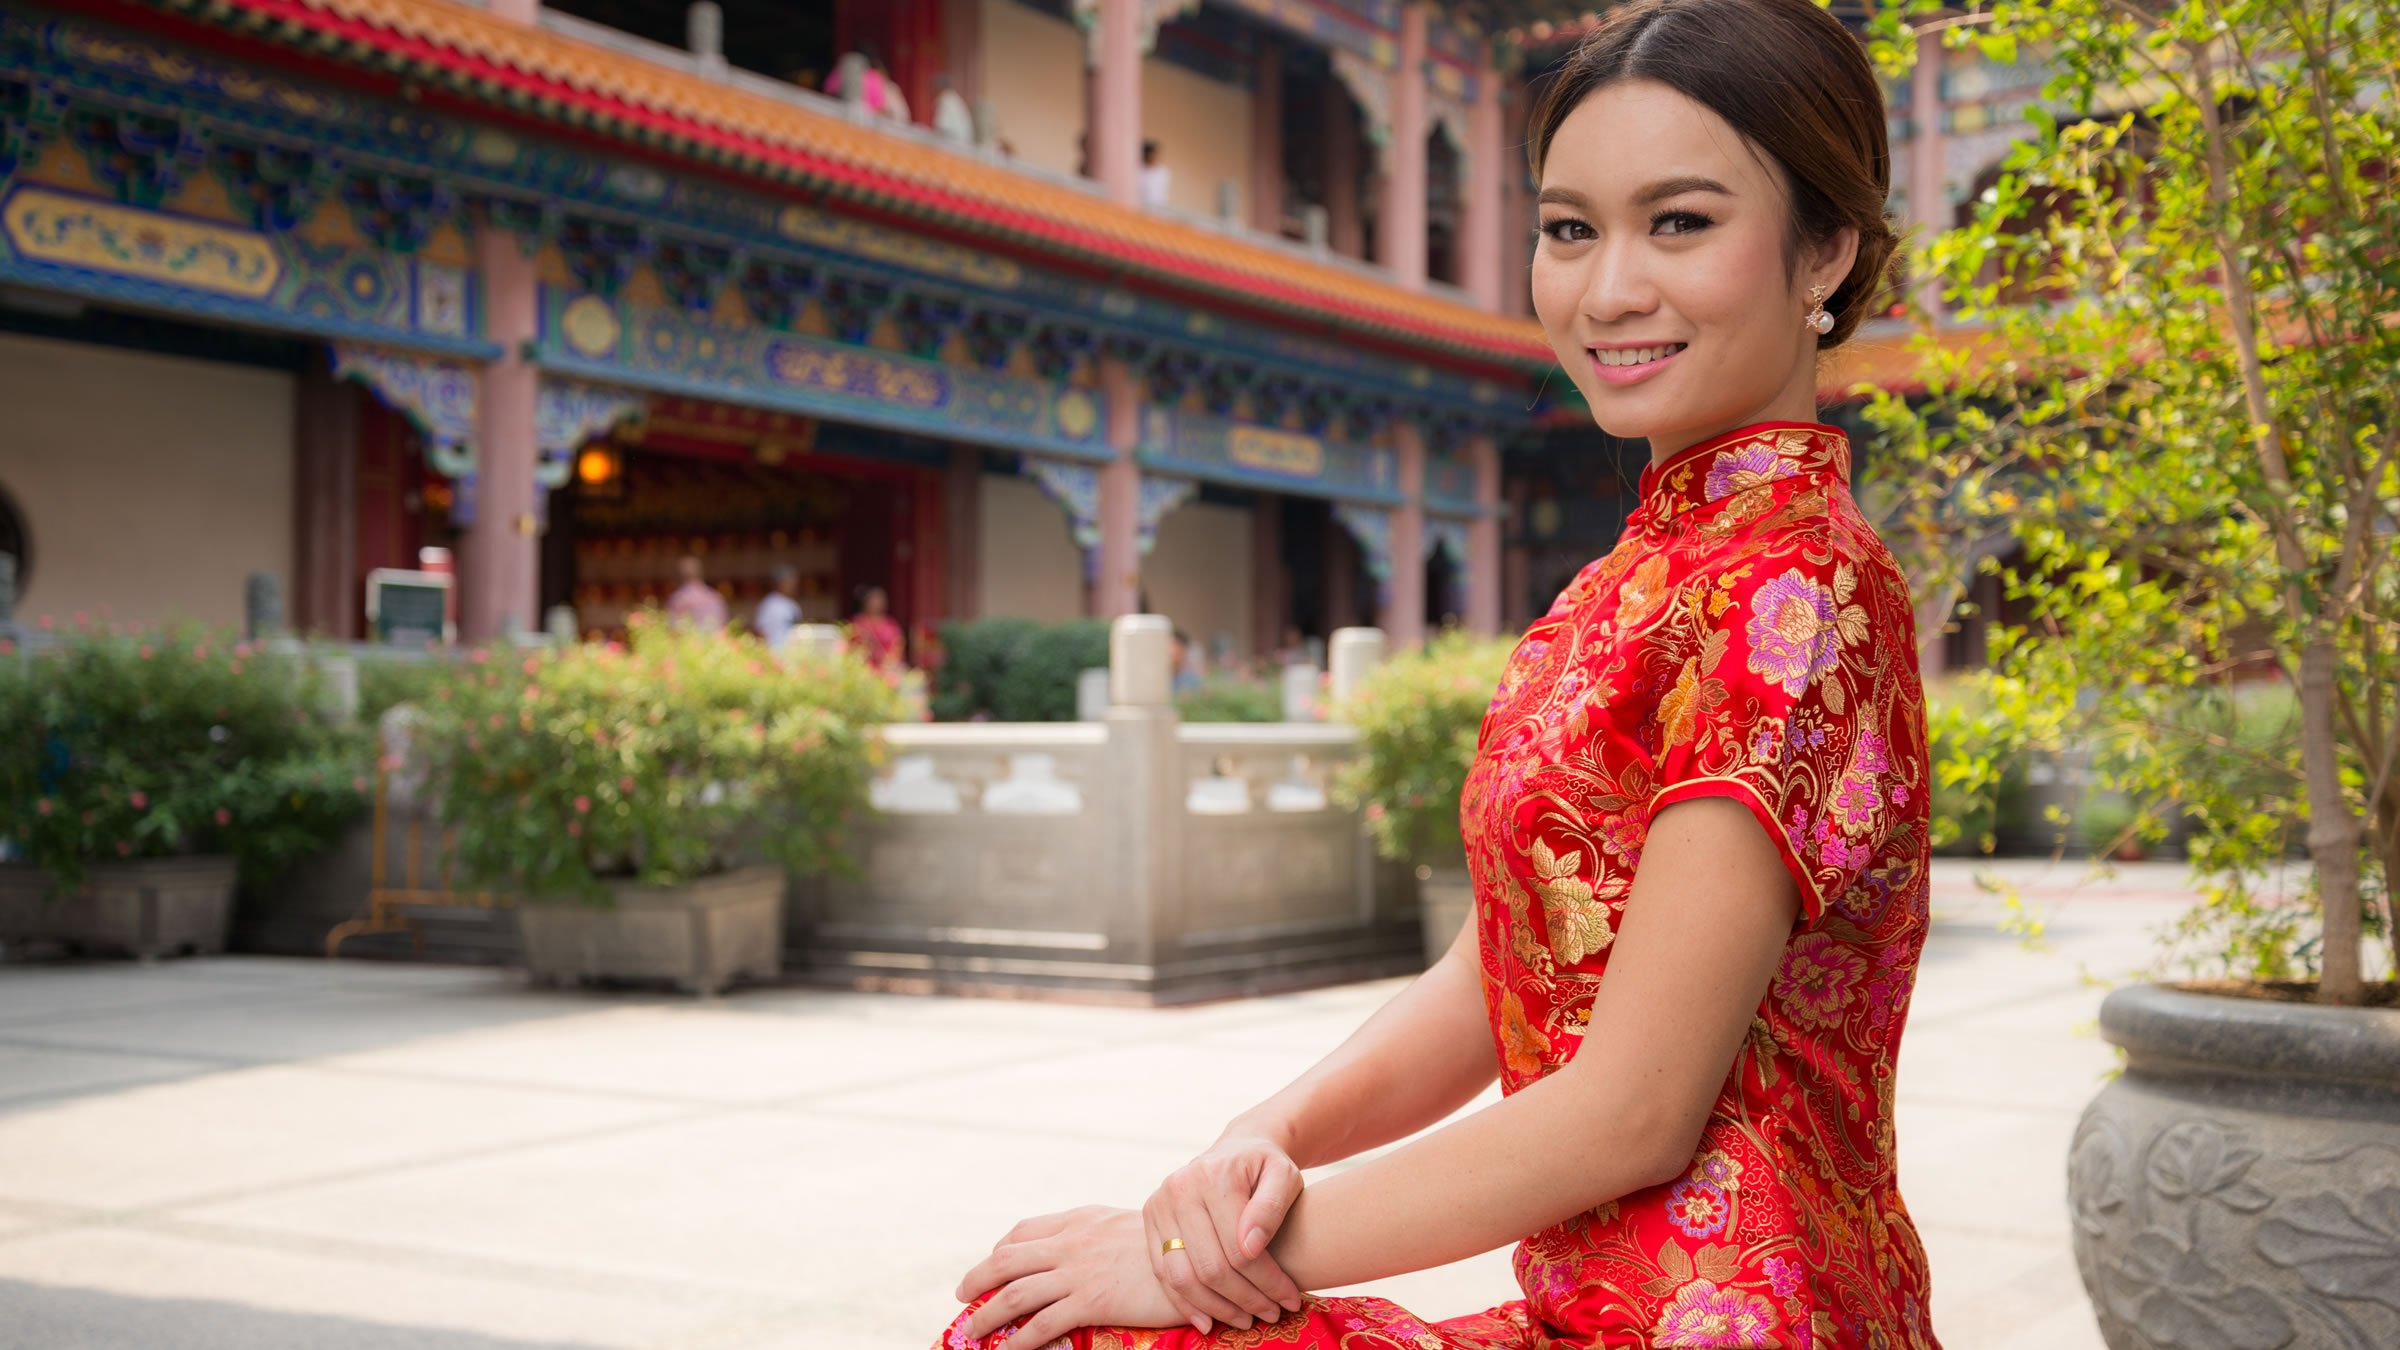 Bokep era del reino de china